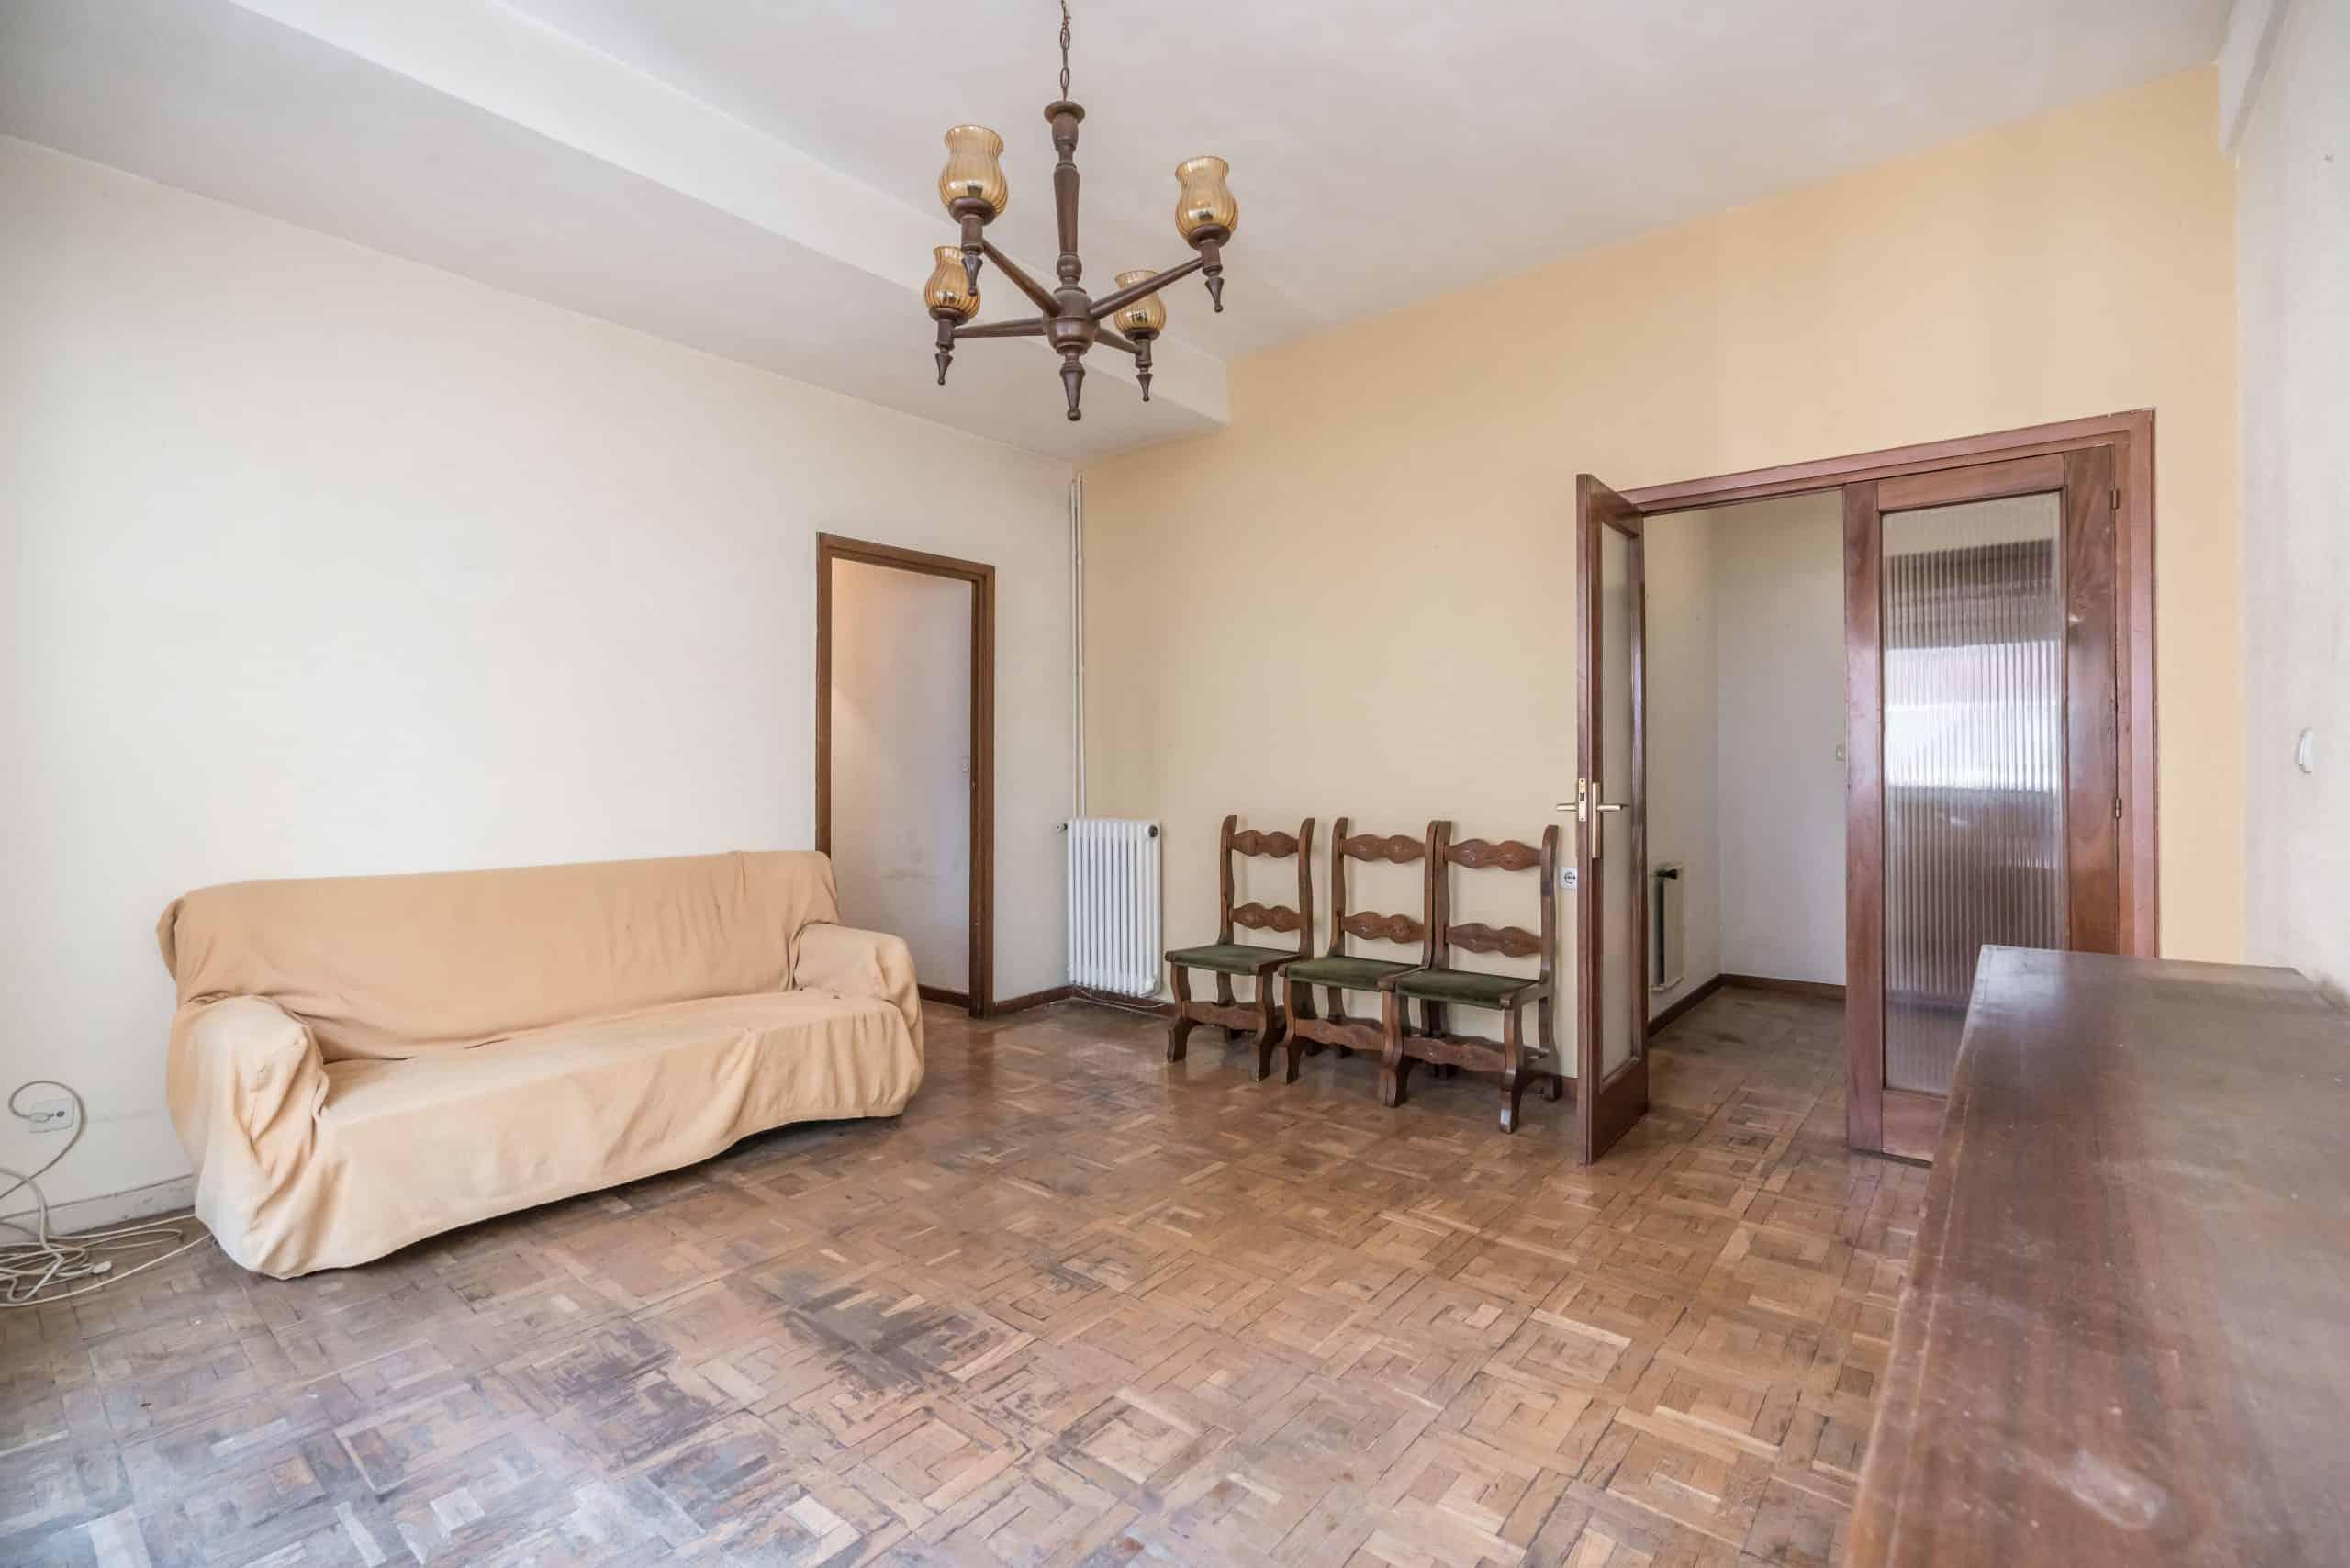 Agencia Inmobiliaria de Madrid-FUTUROCASA-Zona ARGANZUELA-EMBAJADORES-LEGAZPI -calle EMBAJADORES 108-SALON 2 SALON4